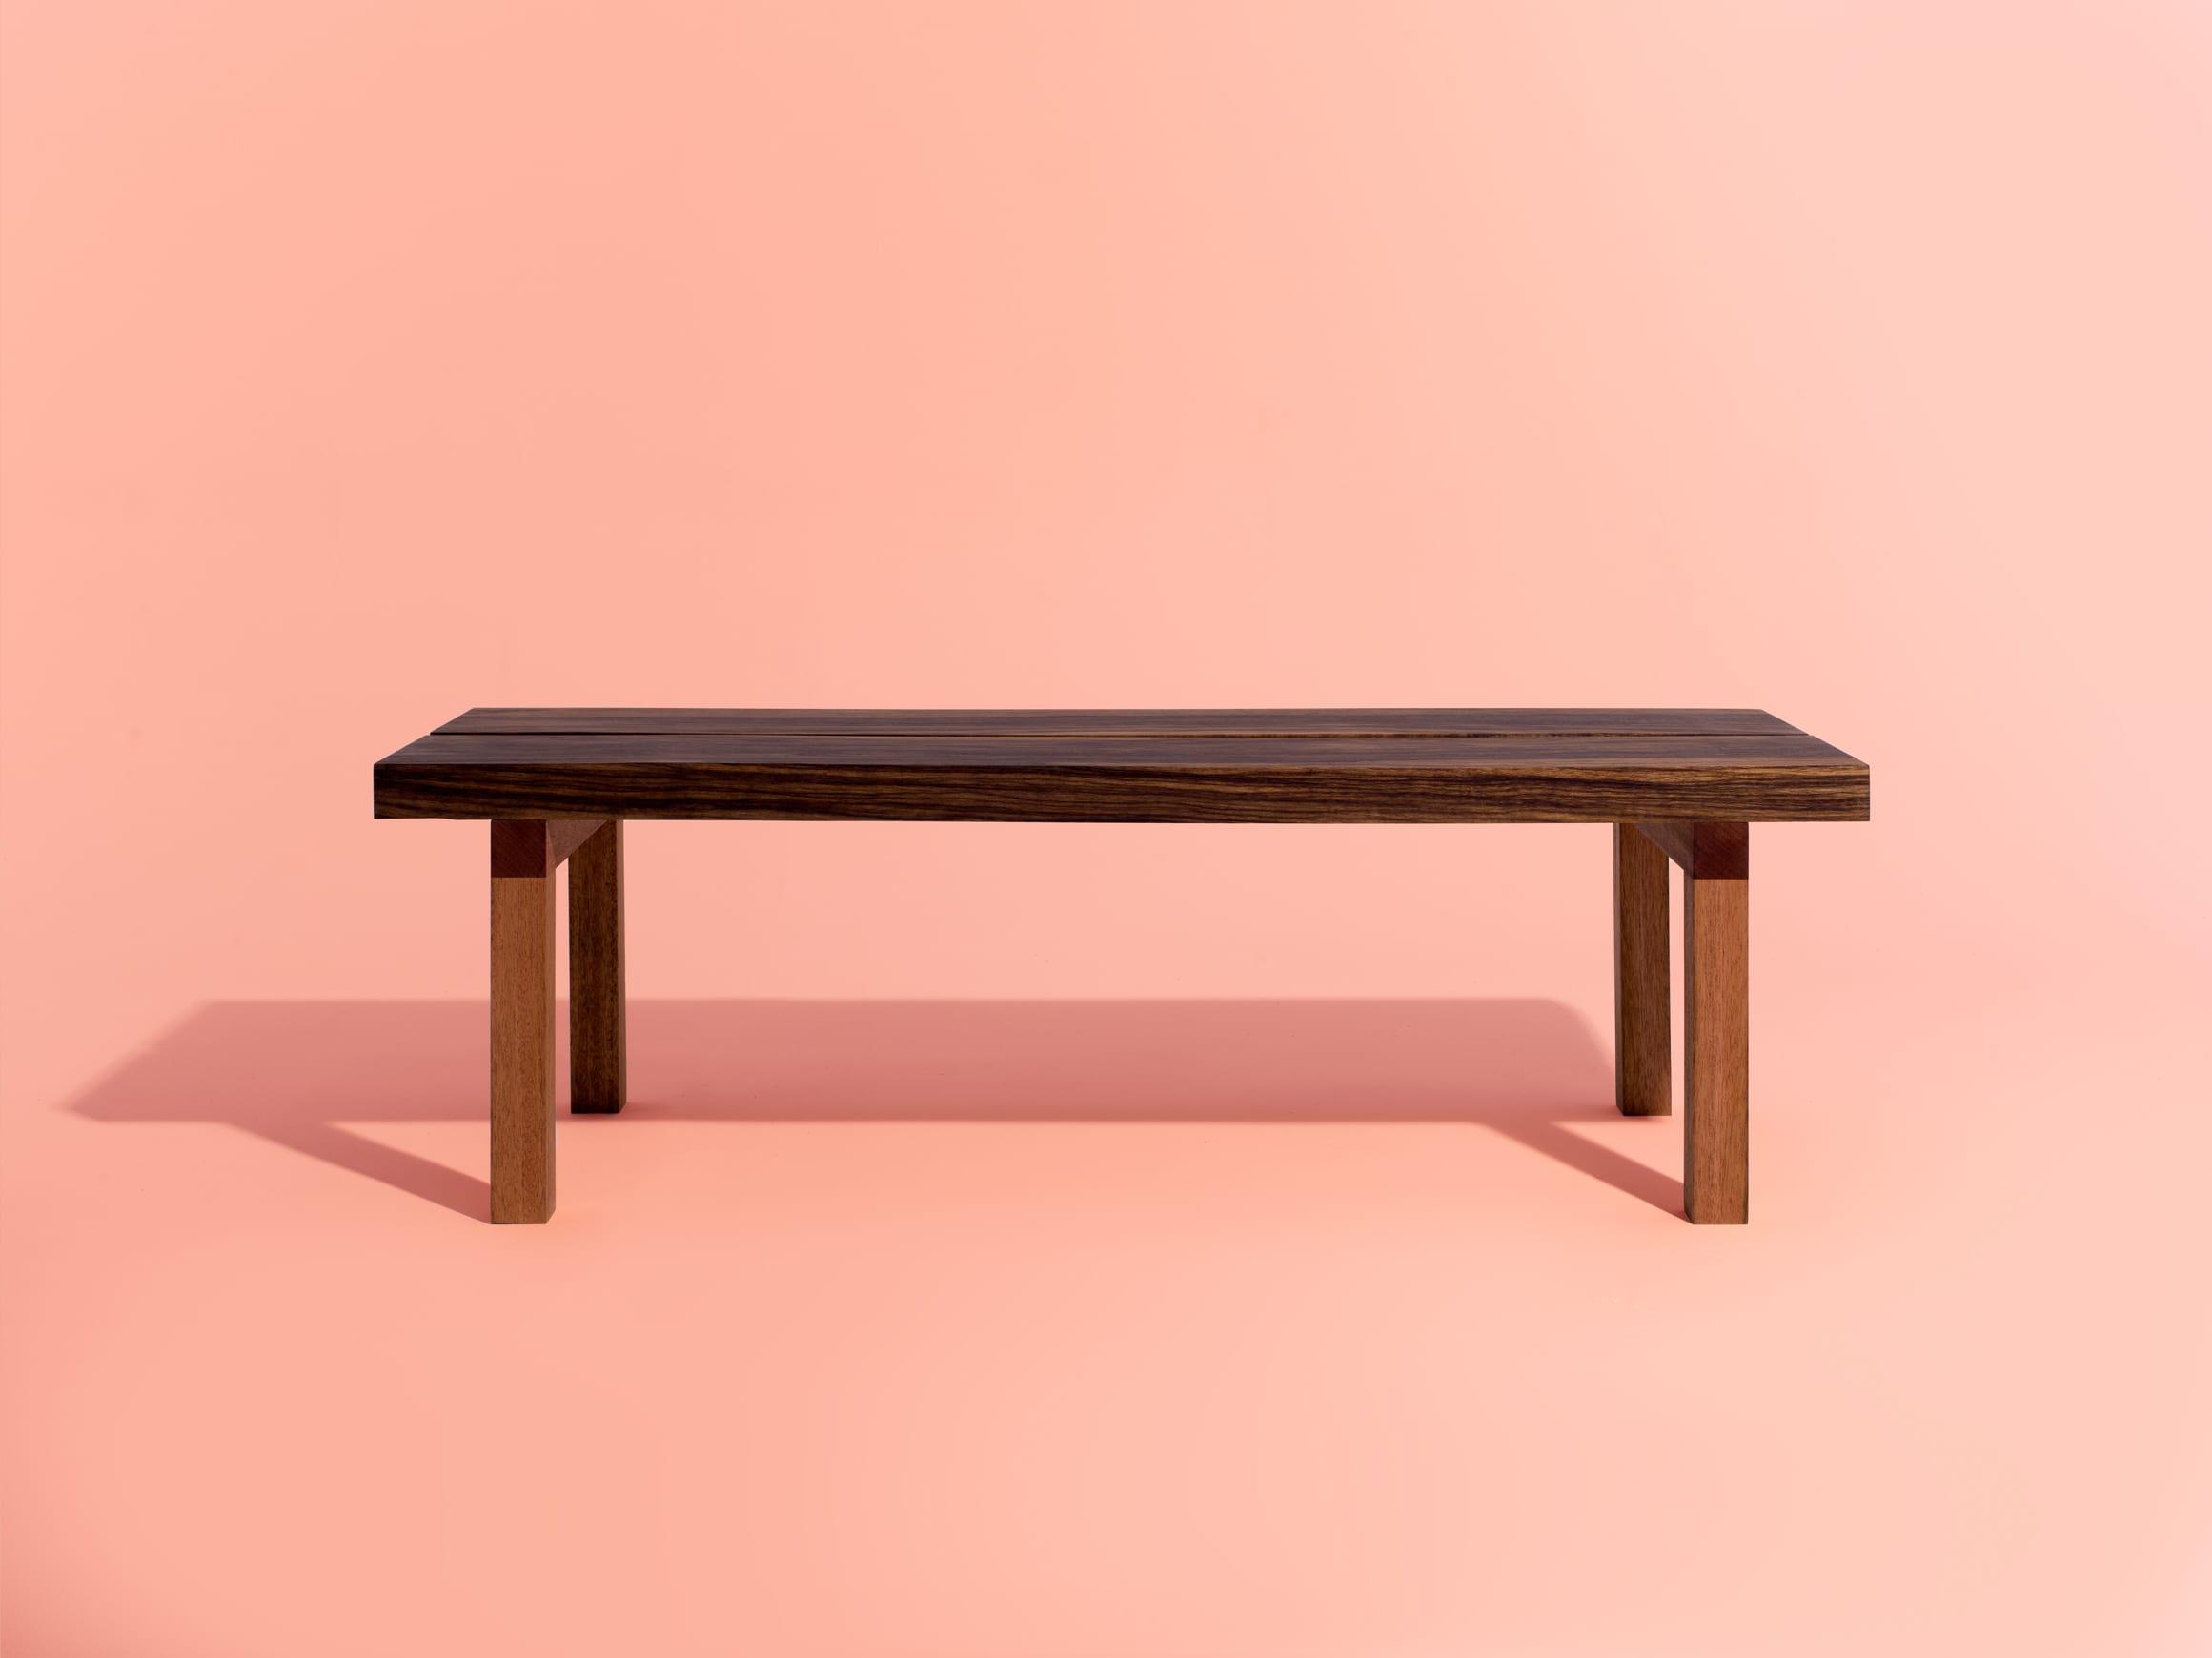 Coffee Table_web__0001_Layer Comp 2